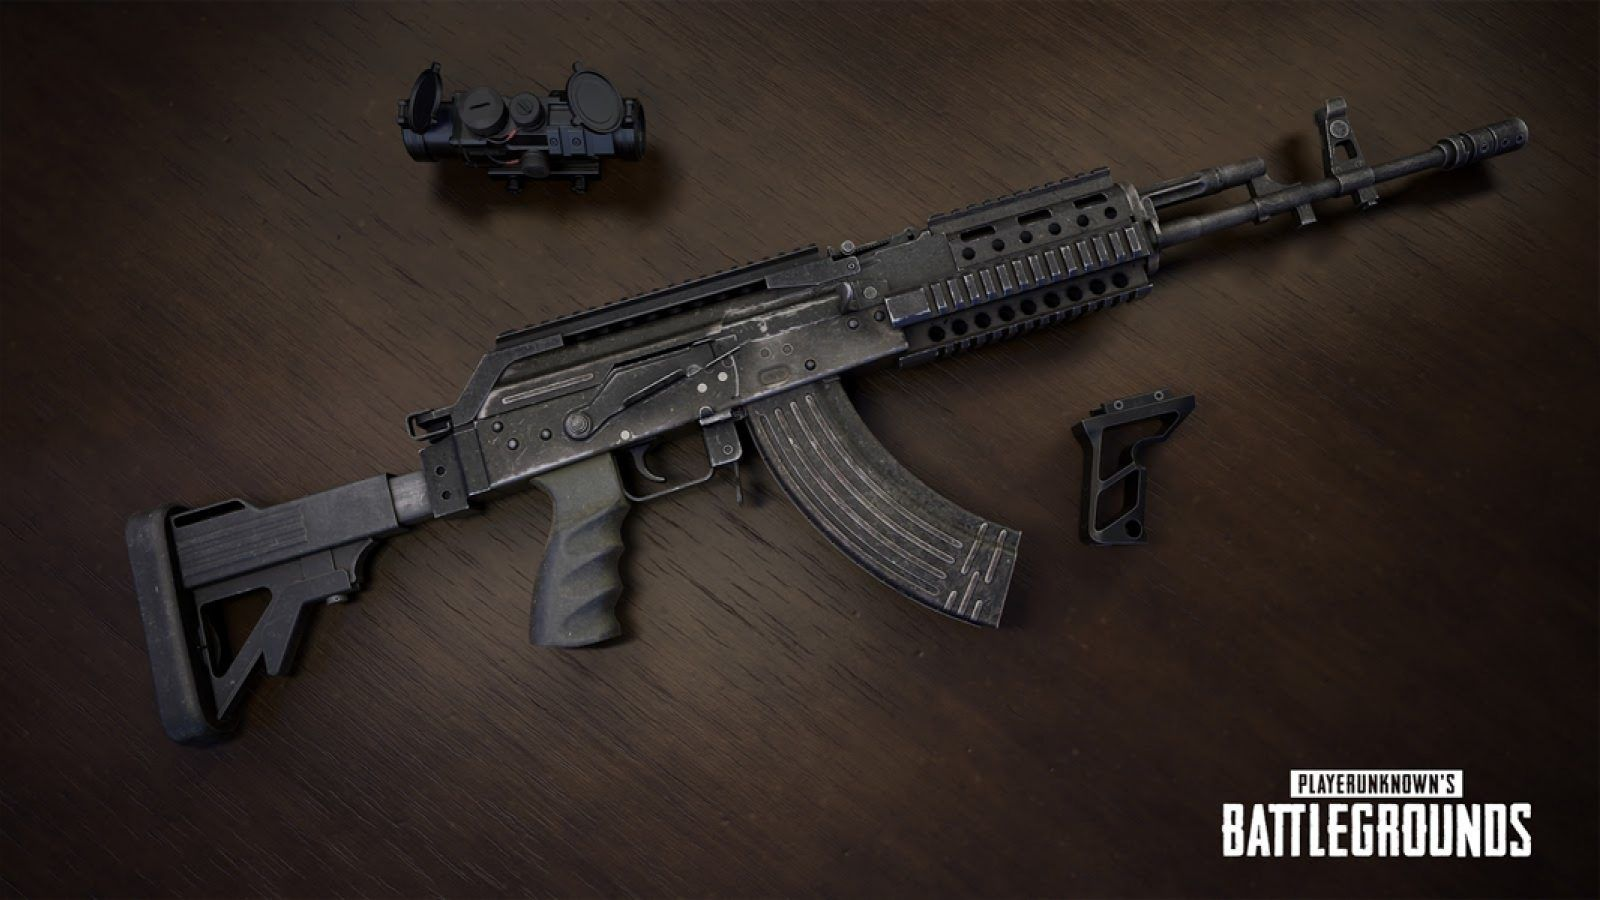 pubg gun 762, pubg wallpaper hd, wallpaper to download for free